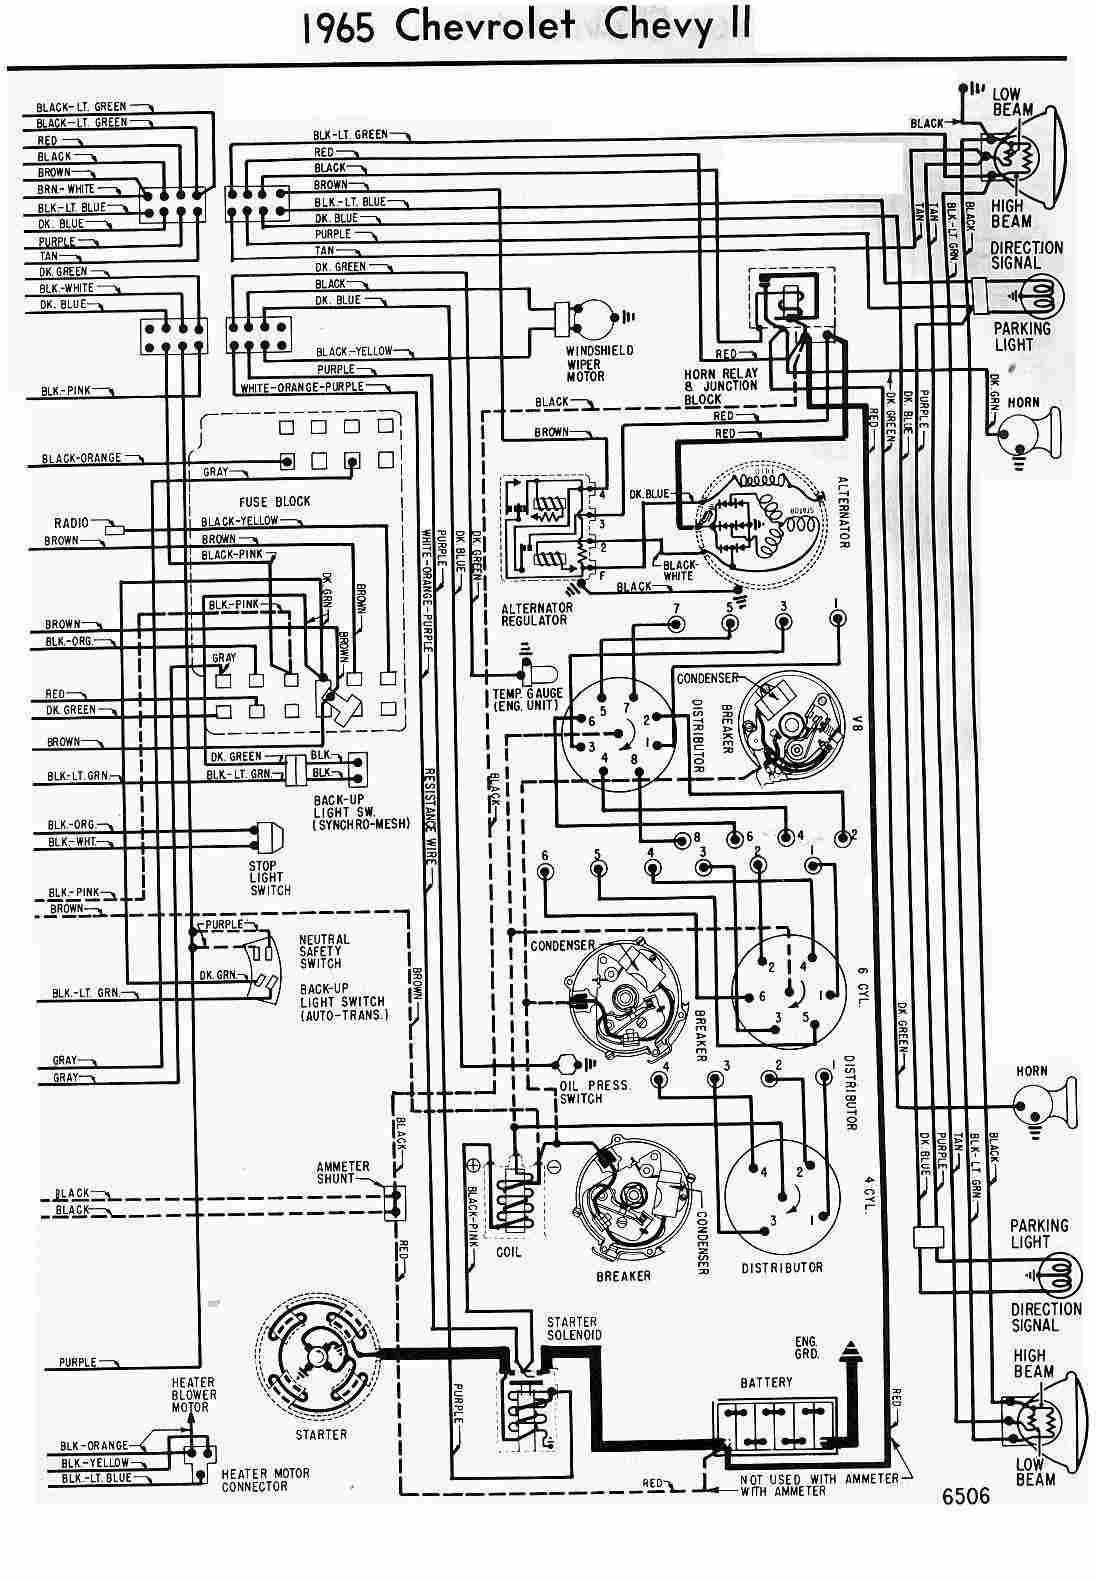 68 caprice wire diagram wiring diagram68 caprice wire diagram wiring diagram ebook68 caprice wire diagram wiring [ 1096 x 1581 Pixel ]